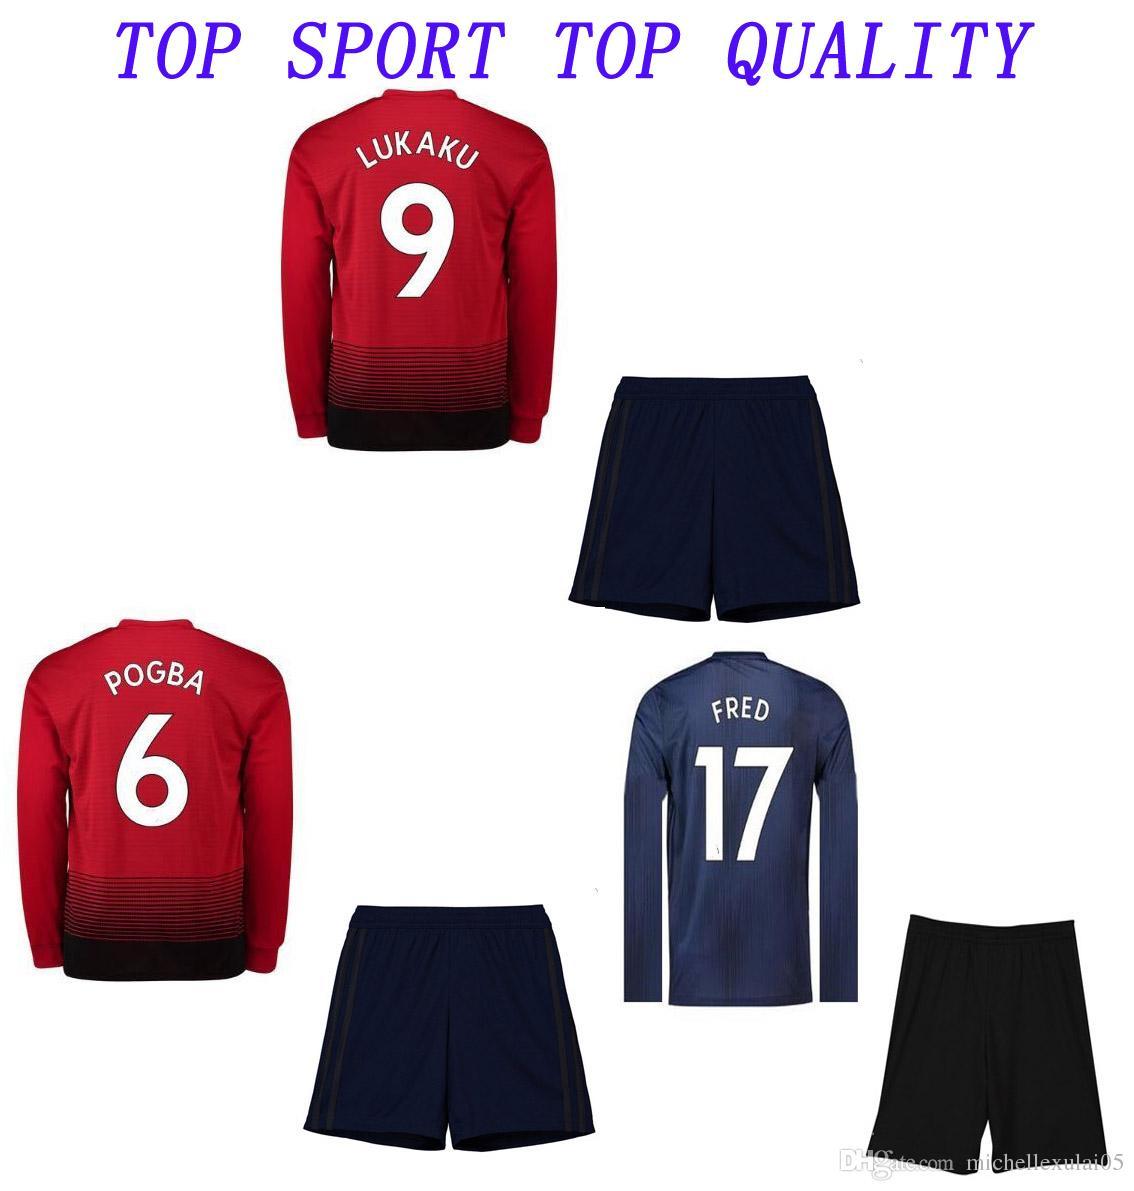 ffc745ab3 2019 18 19 Mache United Soccer Jersey Shorts 2018 19 UTD POGBA LUKAKU  RASHFORD ALEXIS Football Kits Adults Outdoor Sports Training Suits From ...